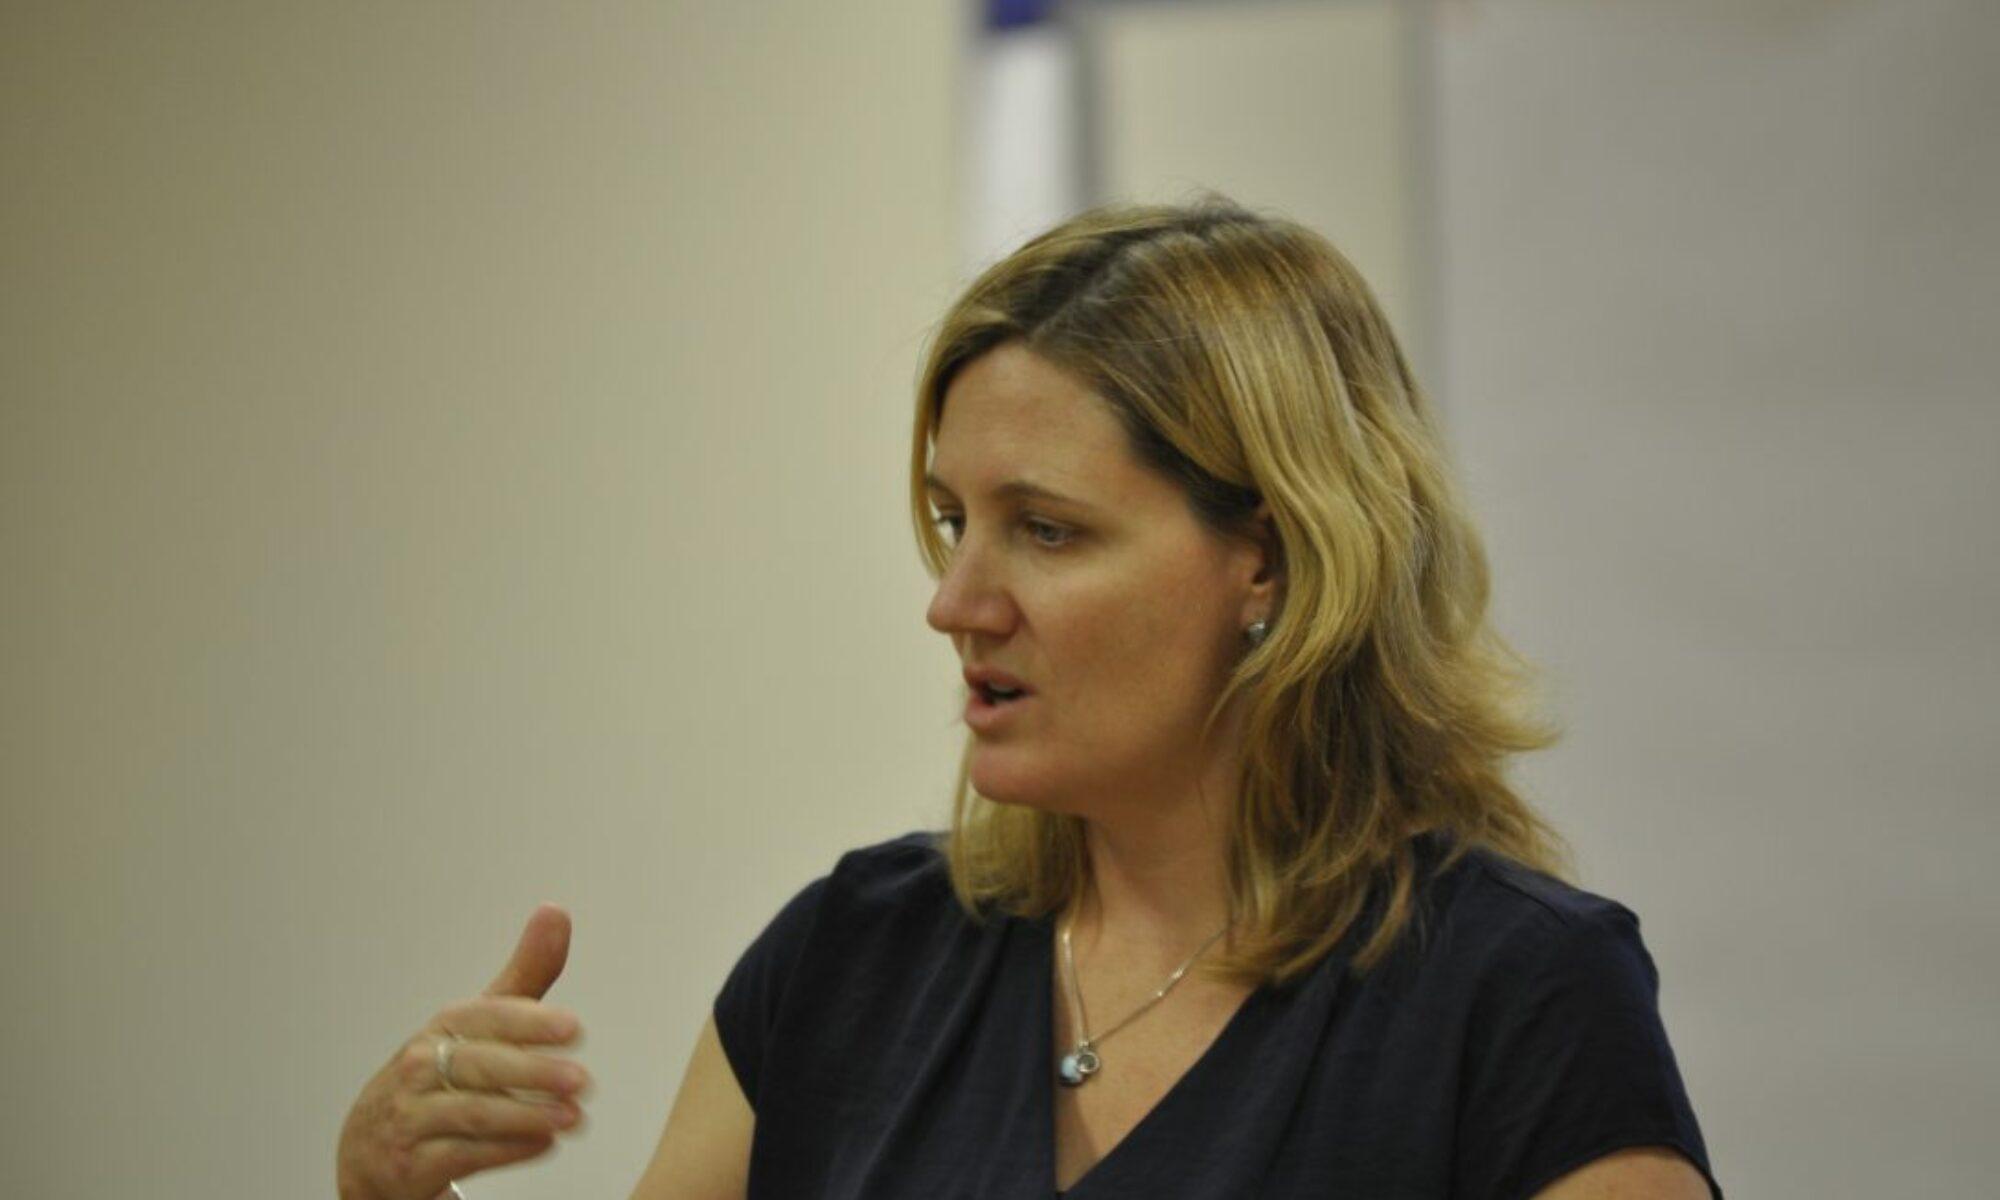 Ruth Roethlisberger